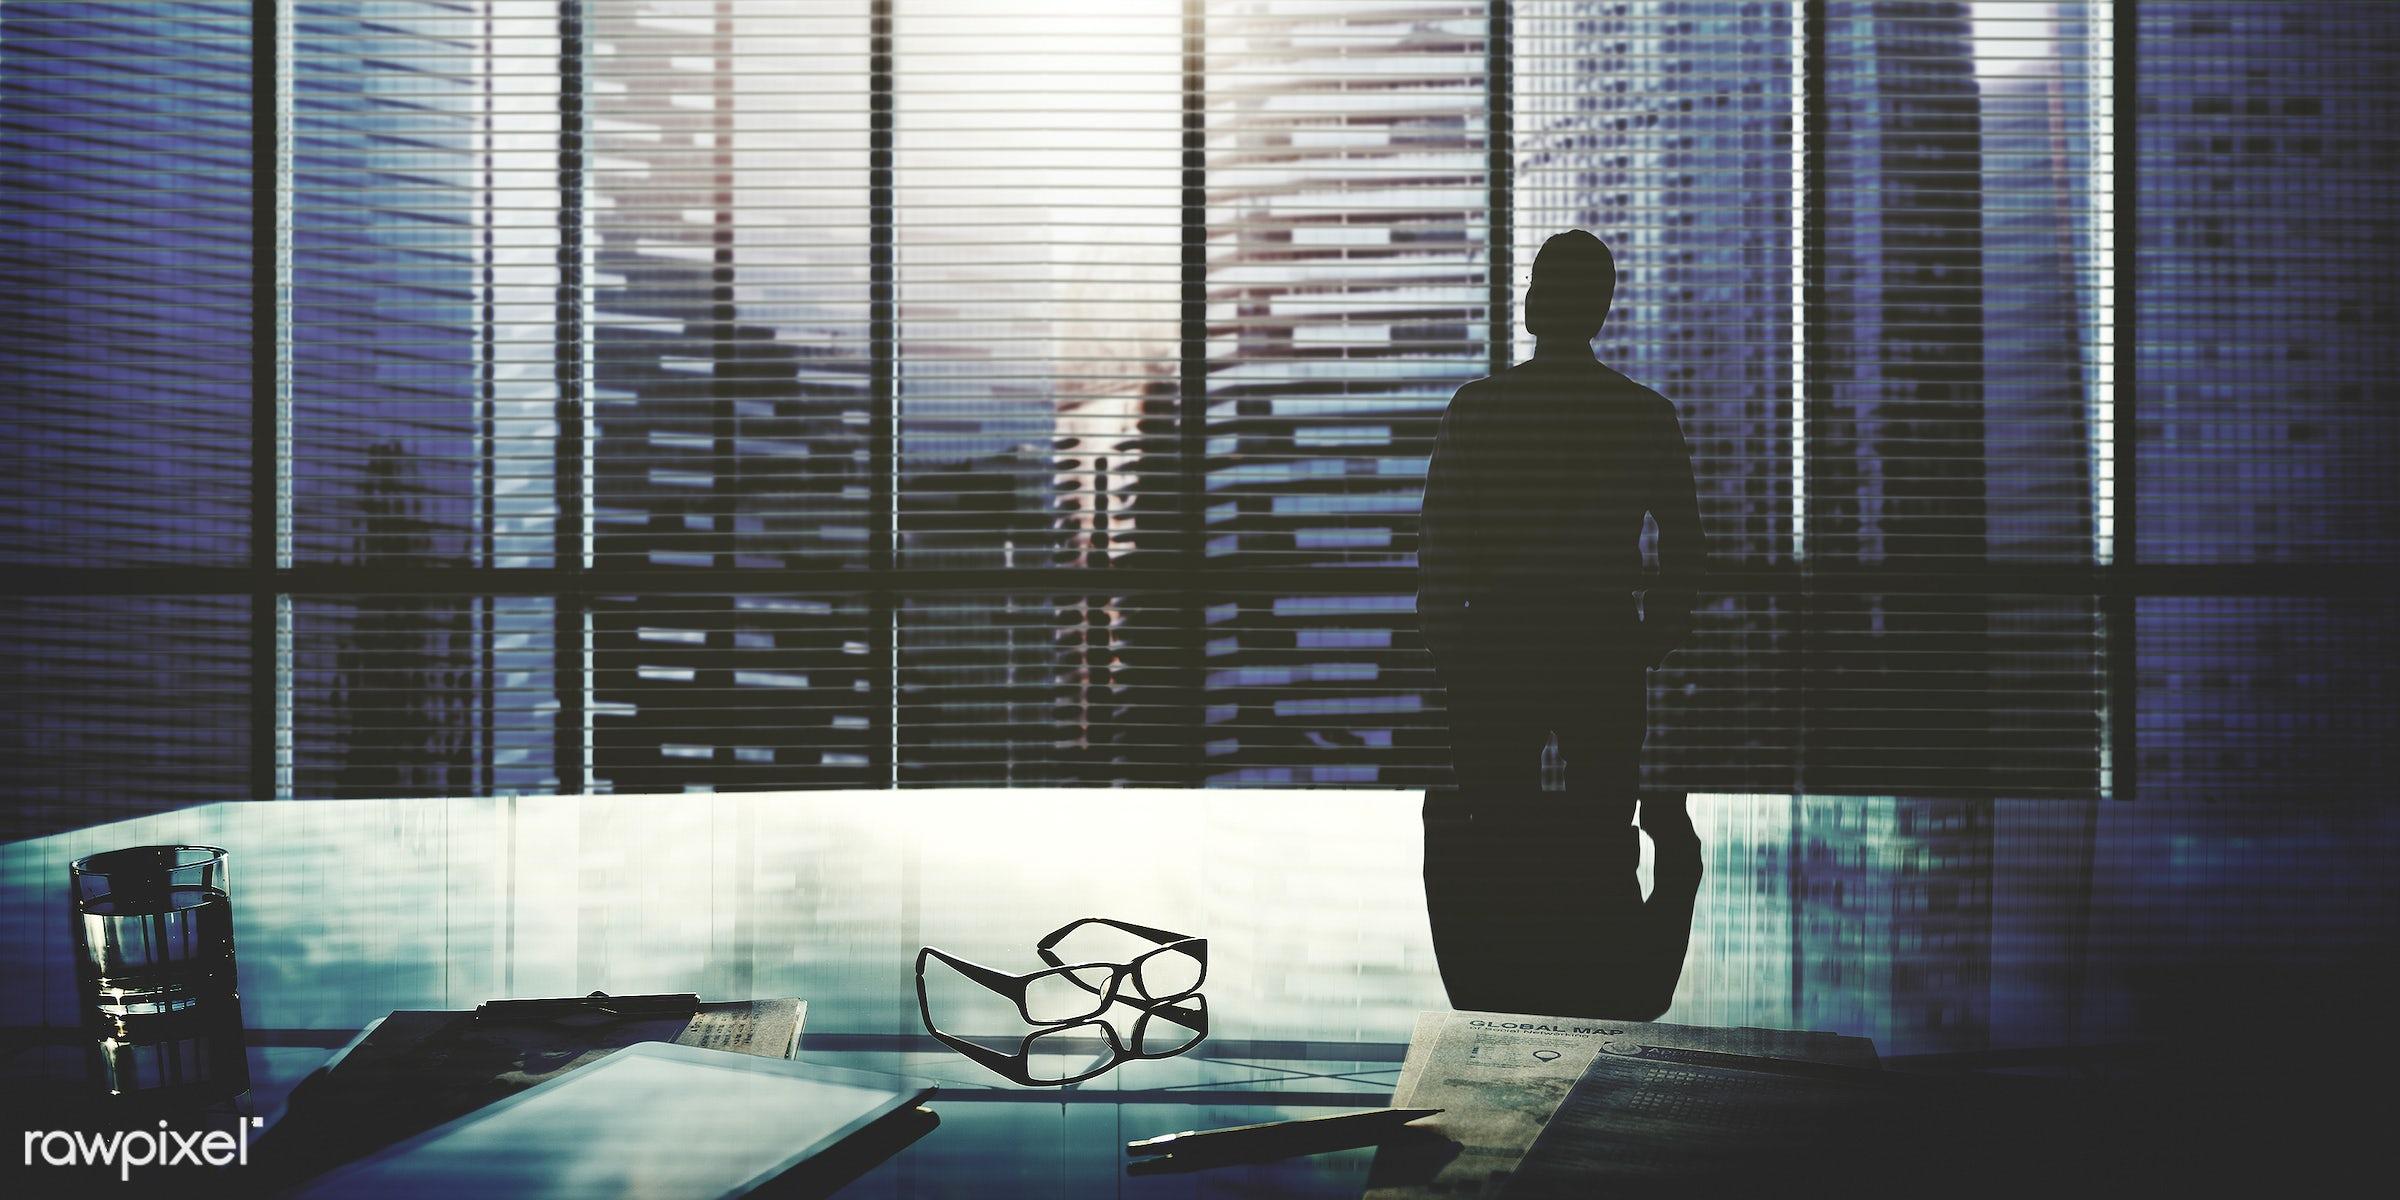 alone, aspiration, backlit, boss, break time, buildings, business, businessman, city, city life, cityscape, contemplating,...